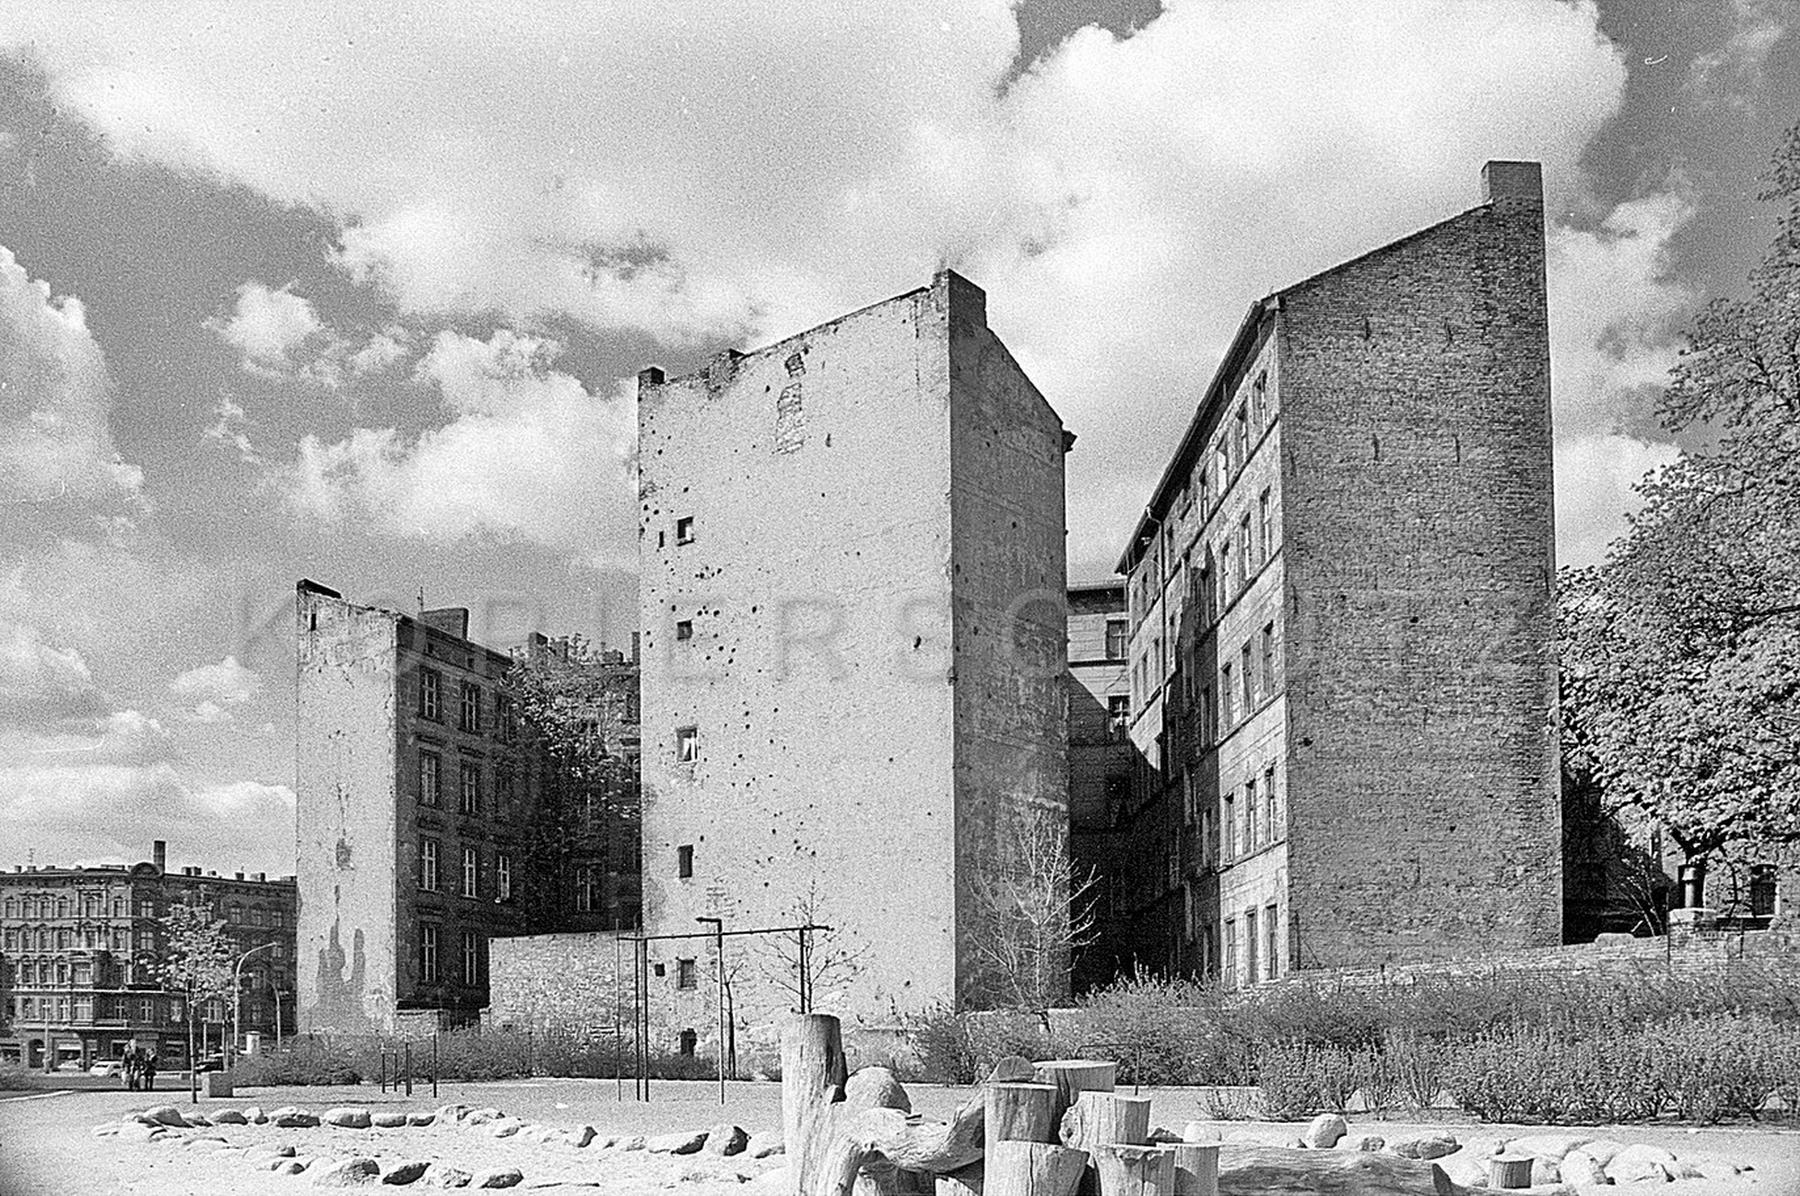 Nr02-036_Kollwitzstr.-1980